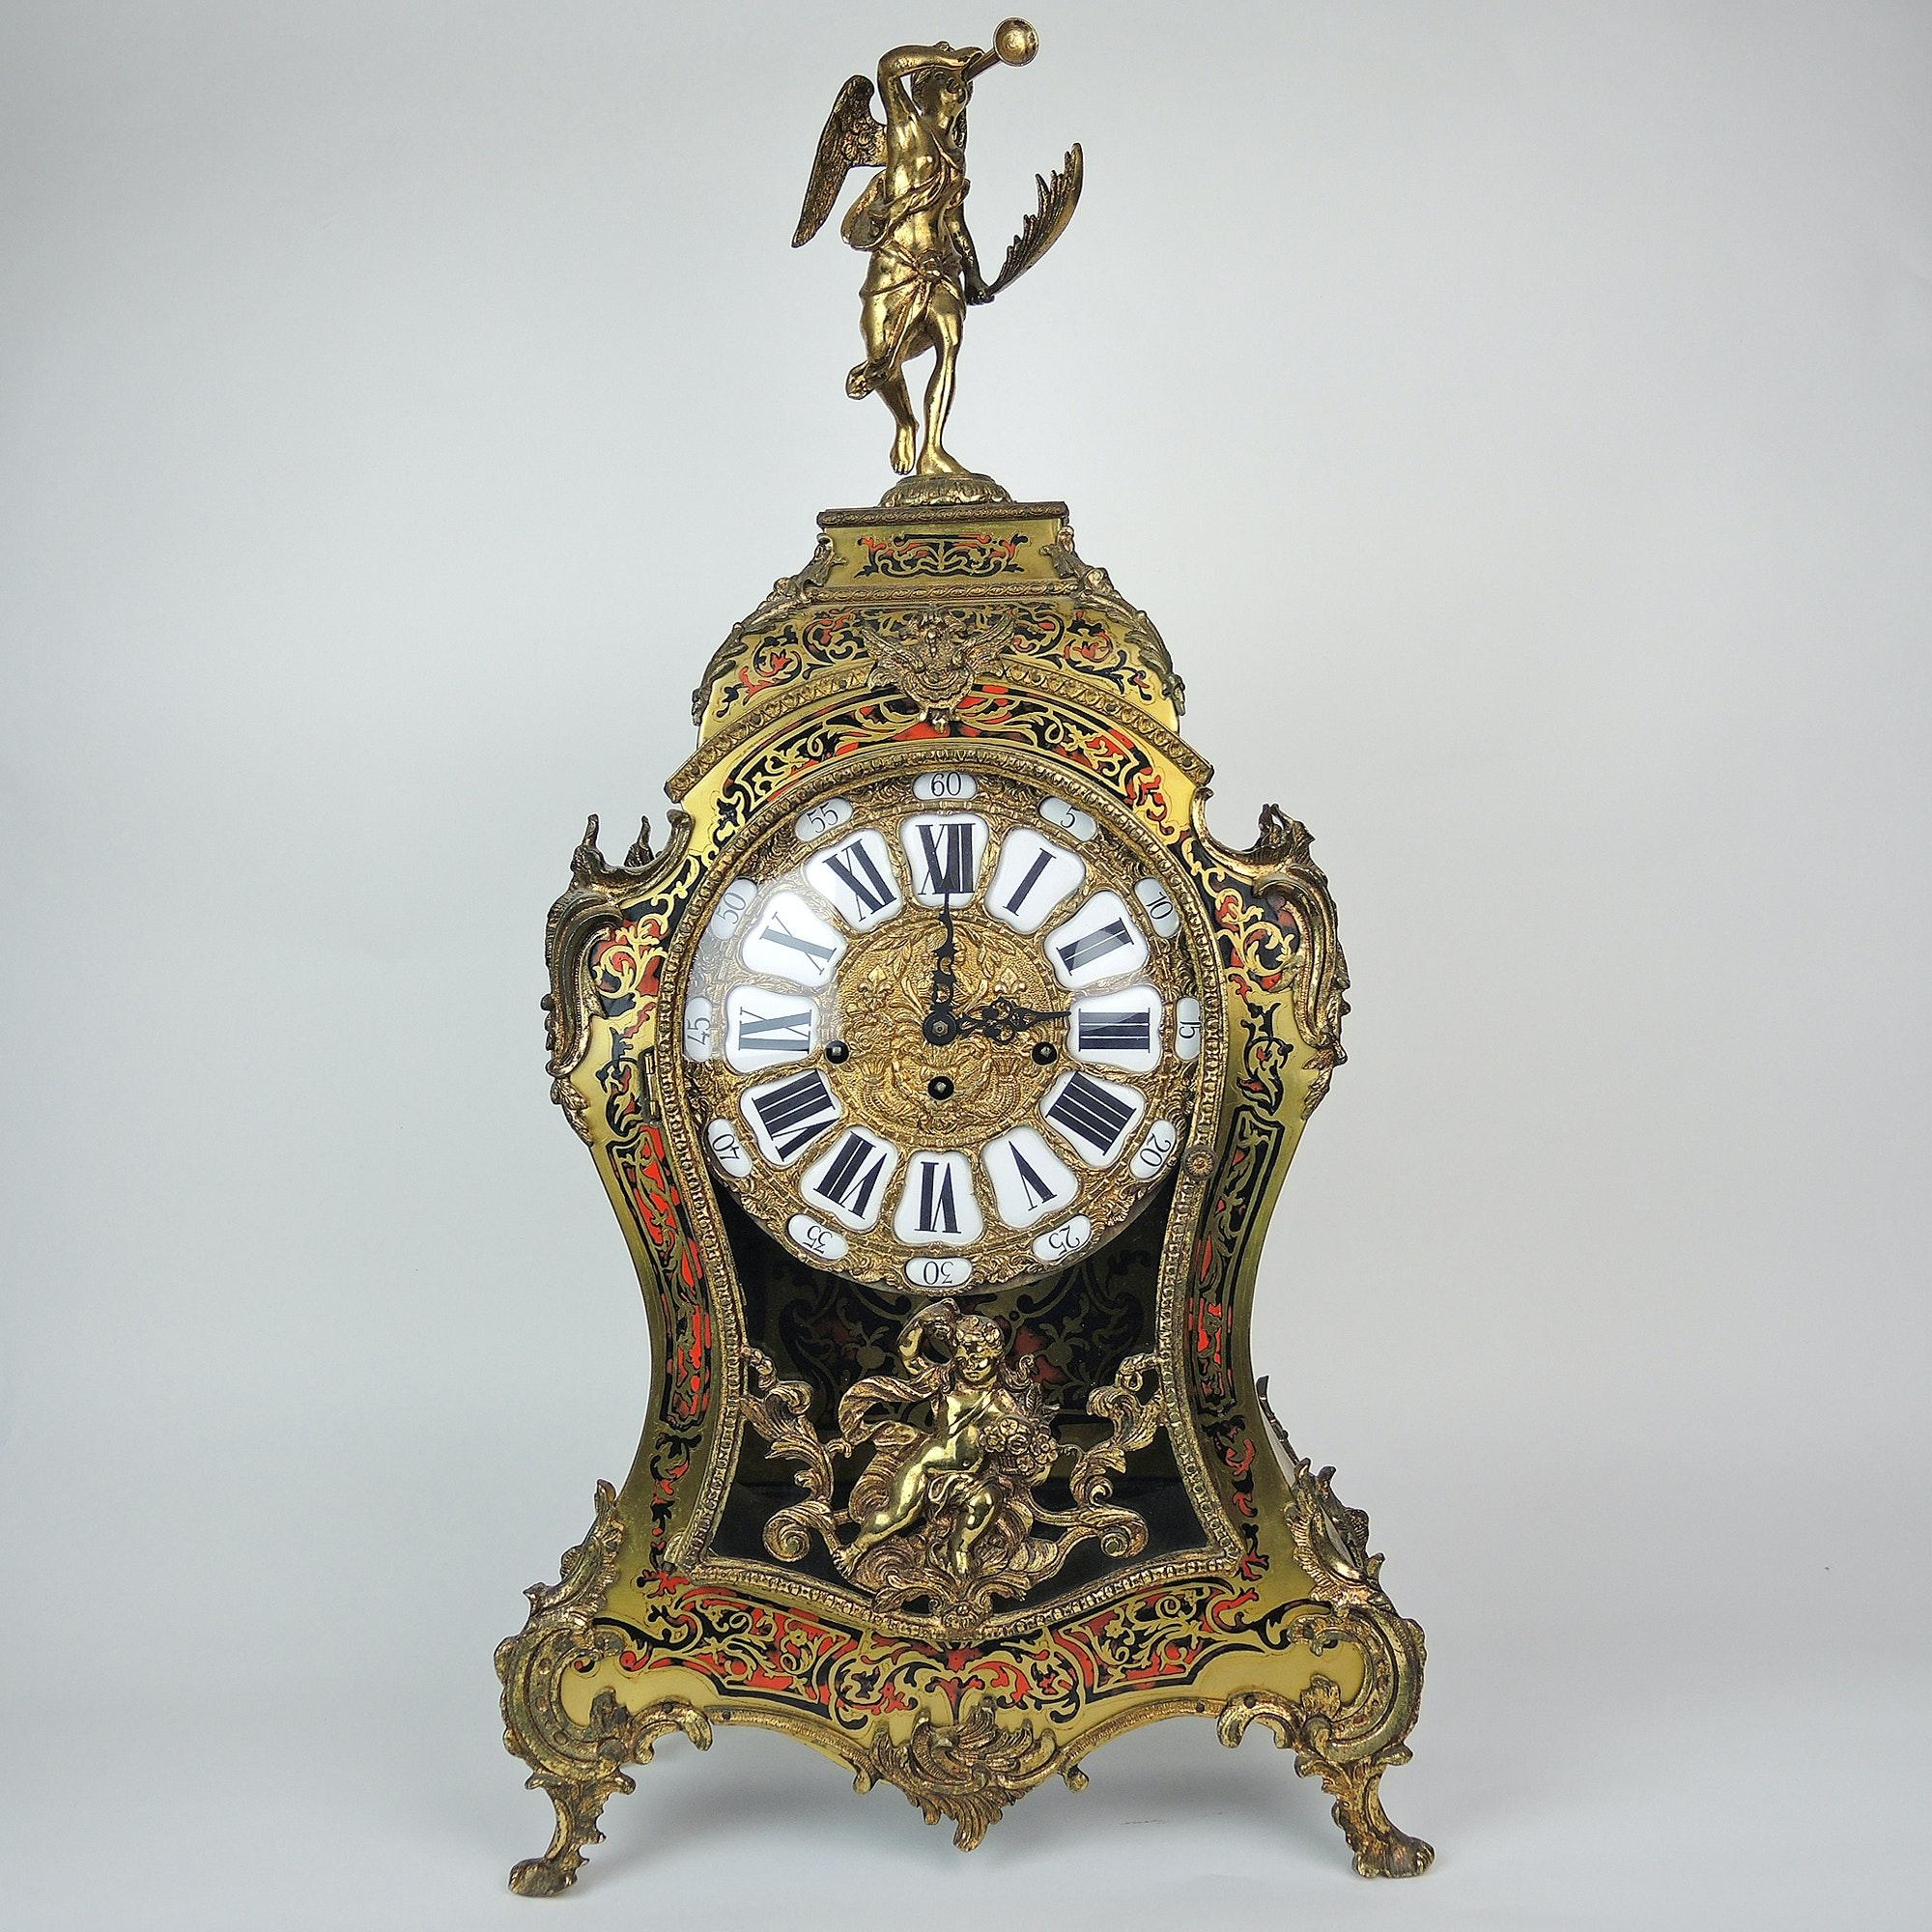 Large c. 1900 Antique French Boulle Mantel Clock